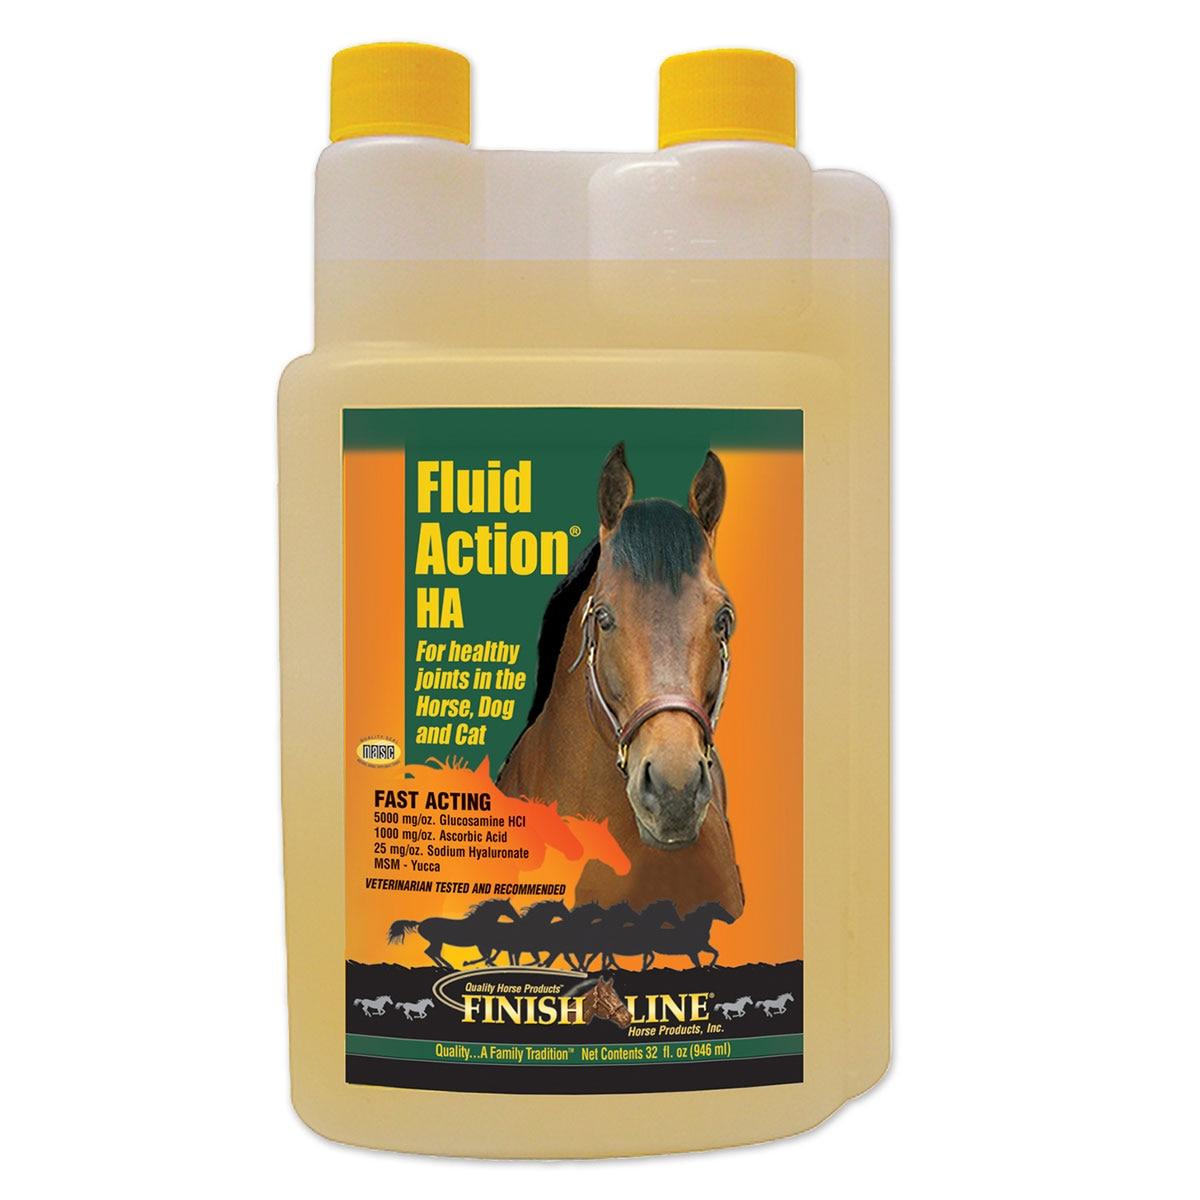 Fluid Action HA Liquid